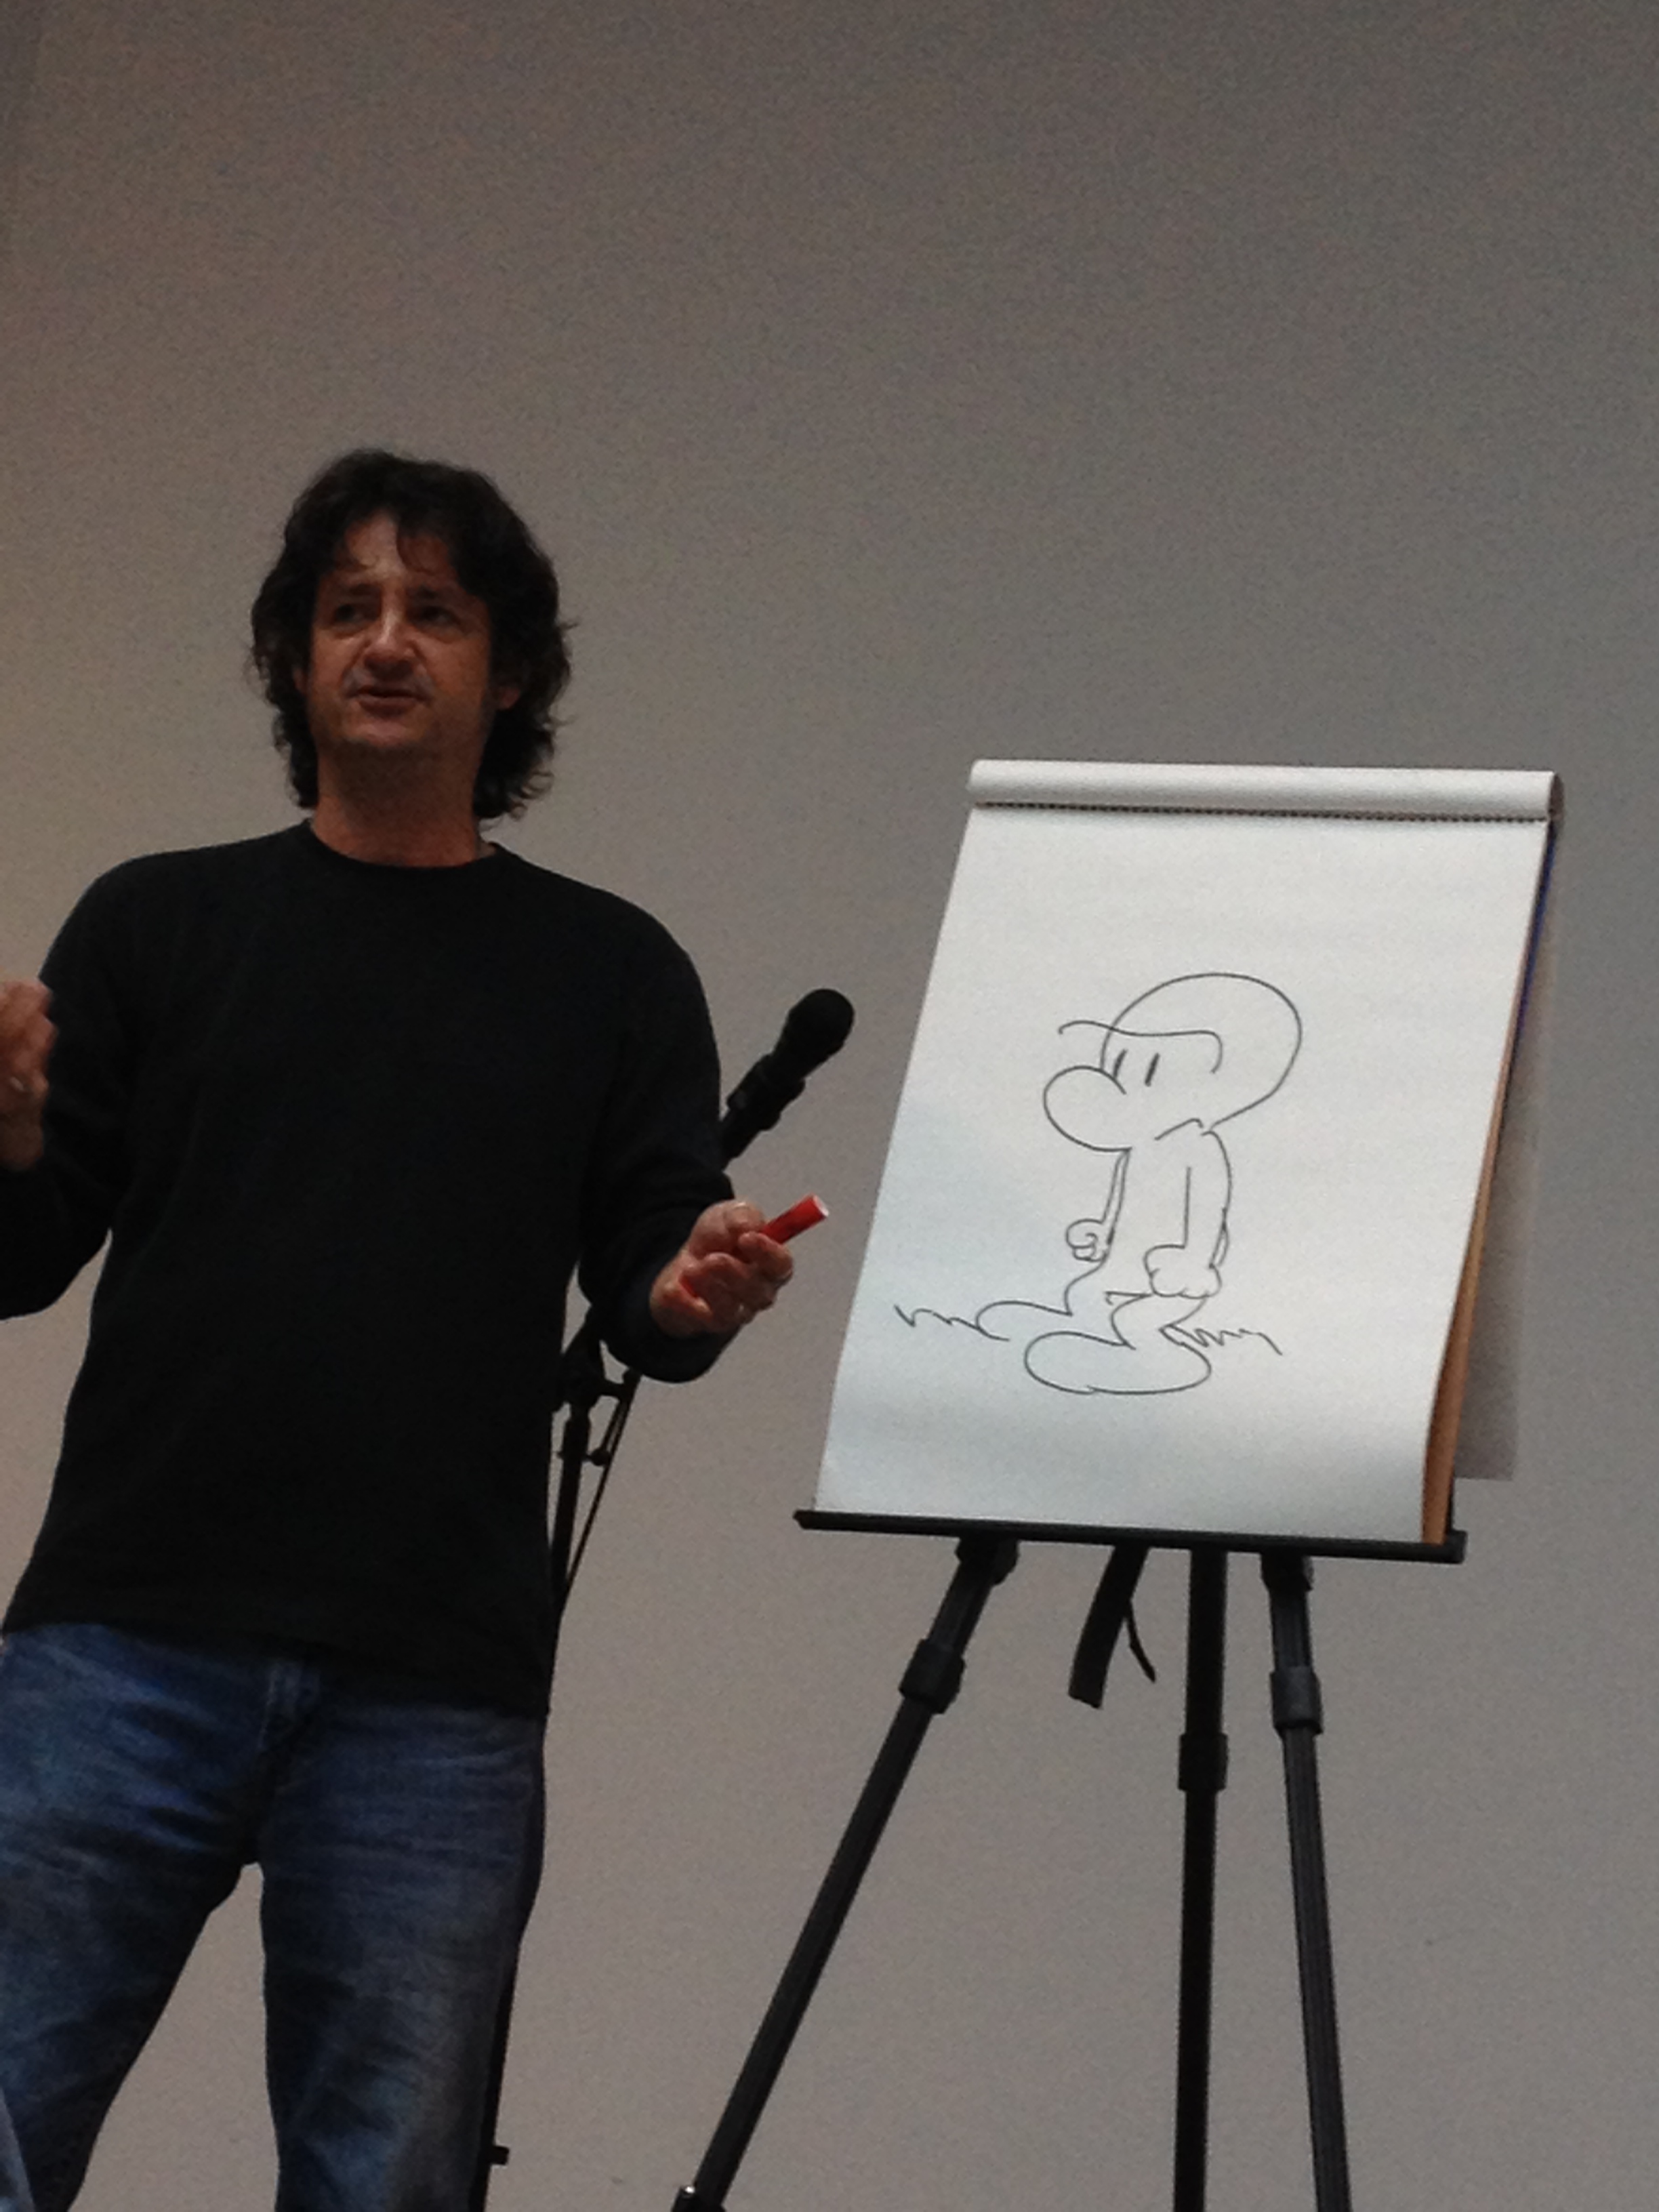 Jeff Smith Books Blog: Meeting Jeff Smith And Kazu Kibuishi